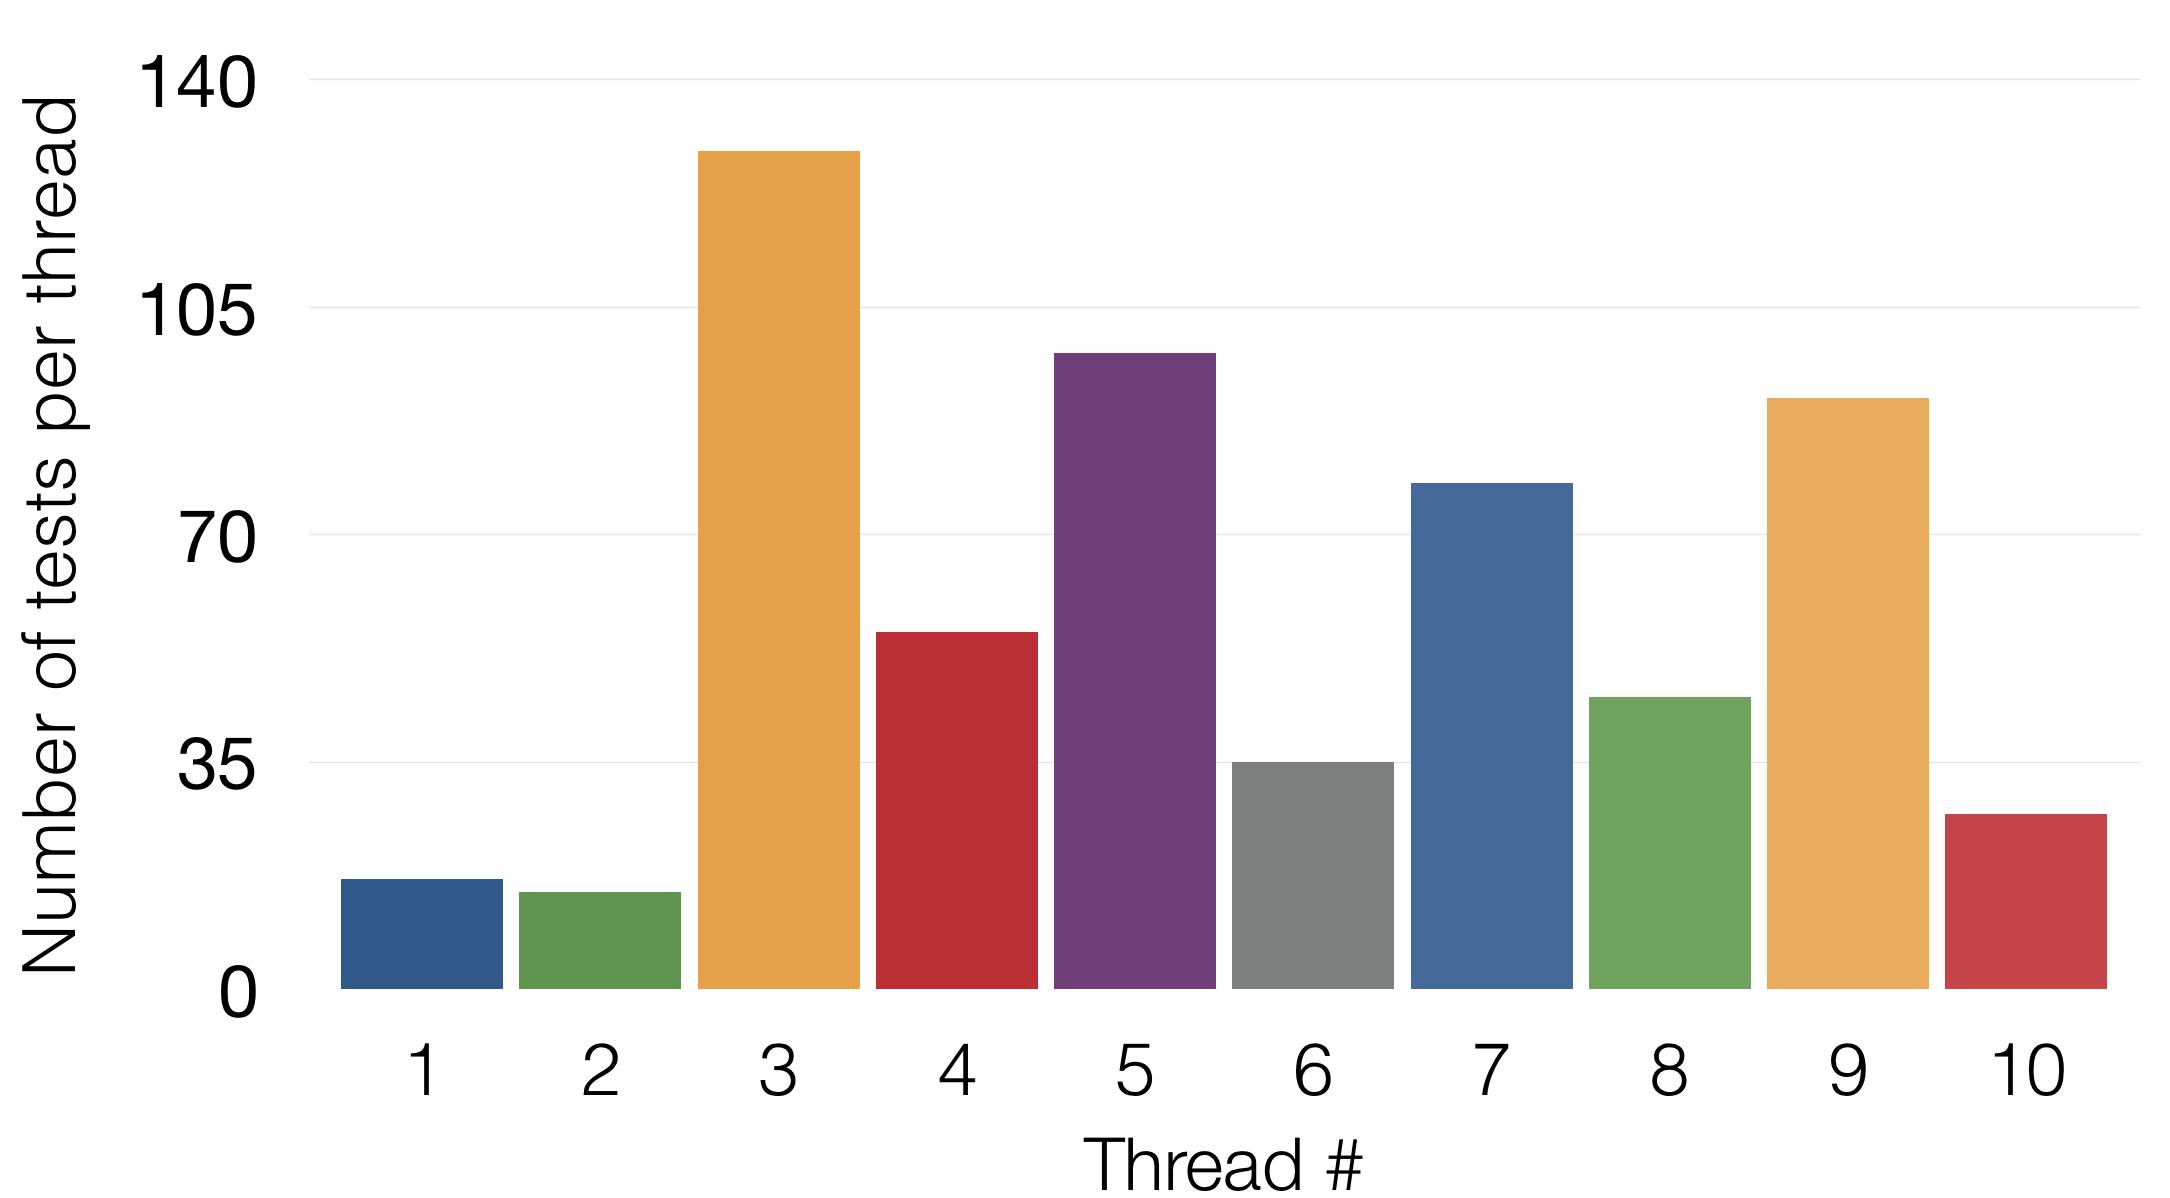 Thread sizes before optimization